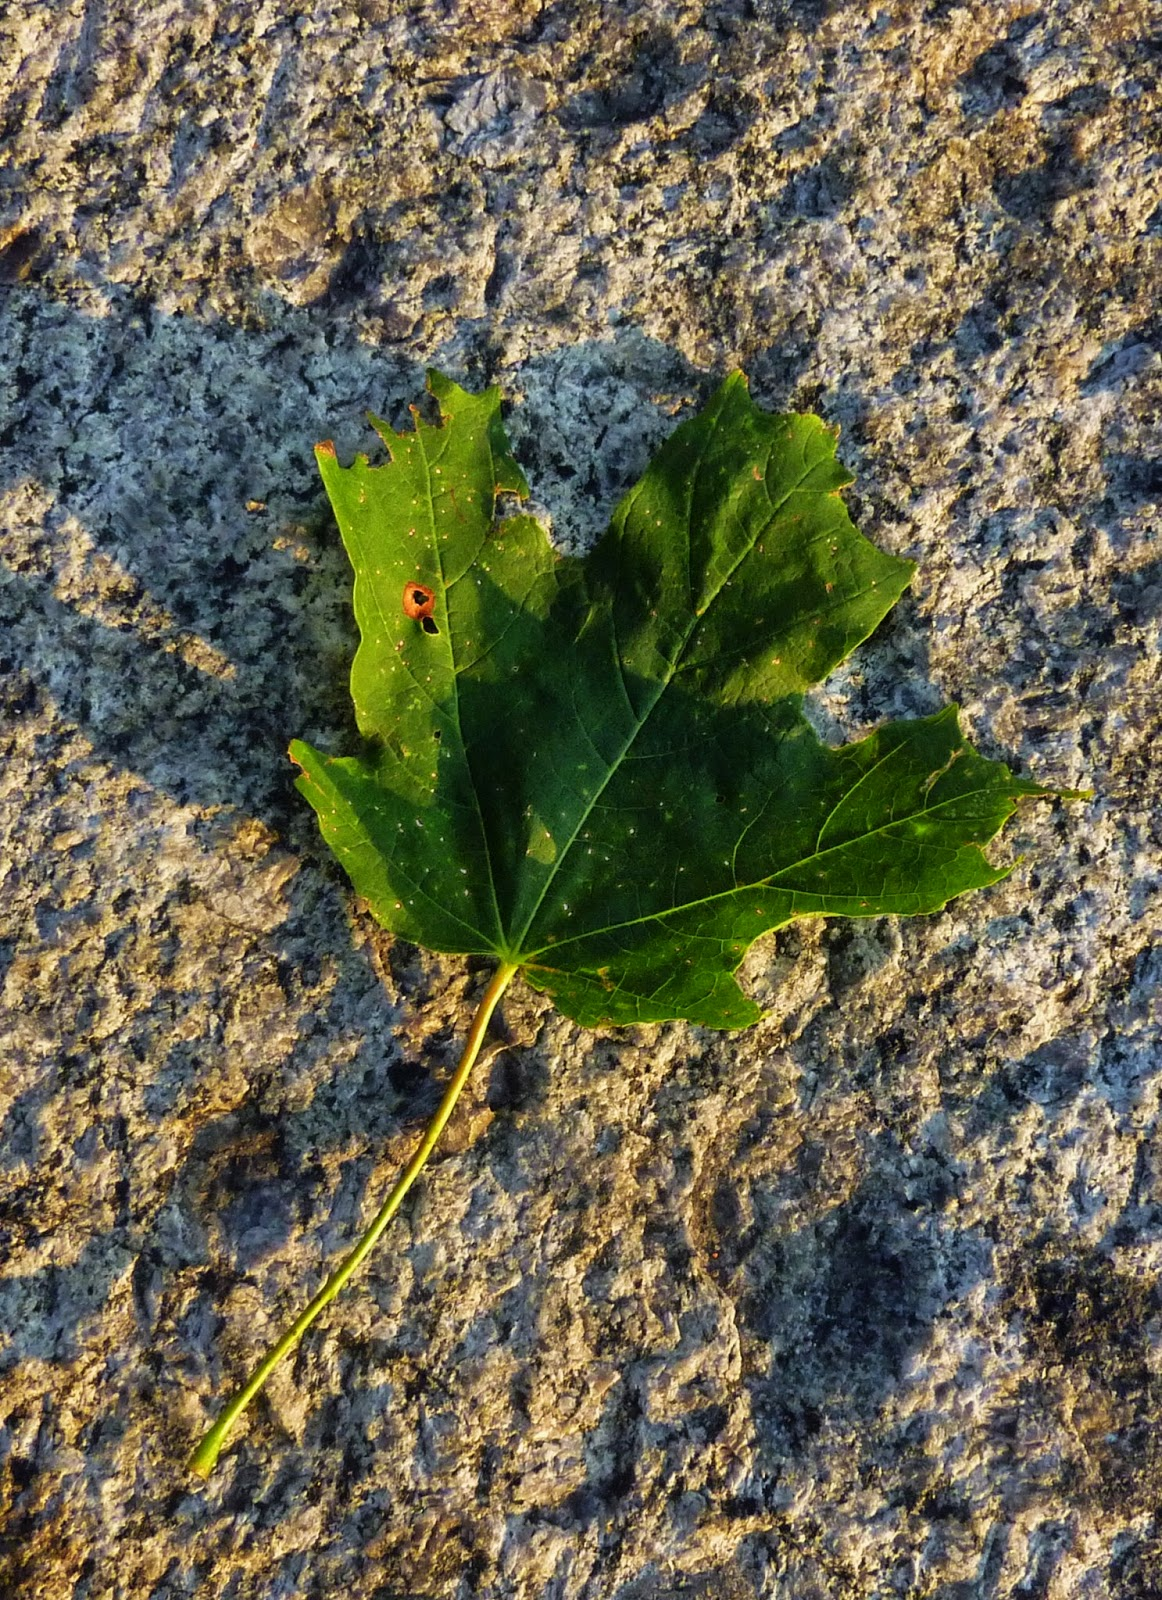 Aventures Canadiennes / Canadian Adventures – Part 1